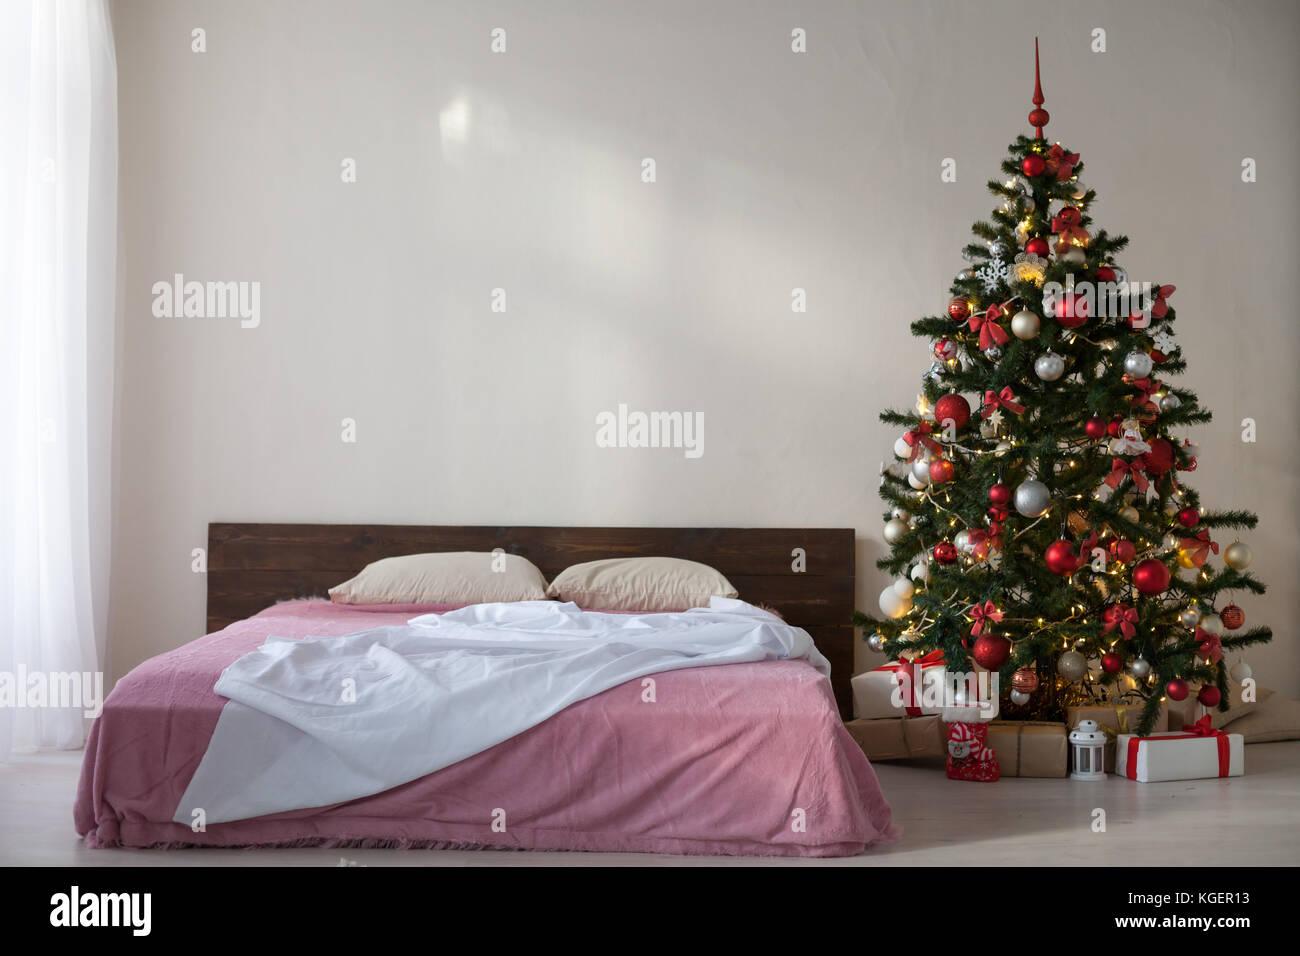 2018 2019 Stock Photos & 2018 2019 Stock Images - Alamy